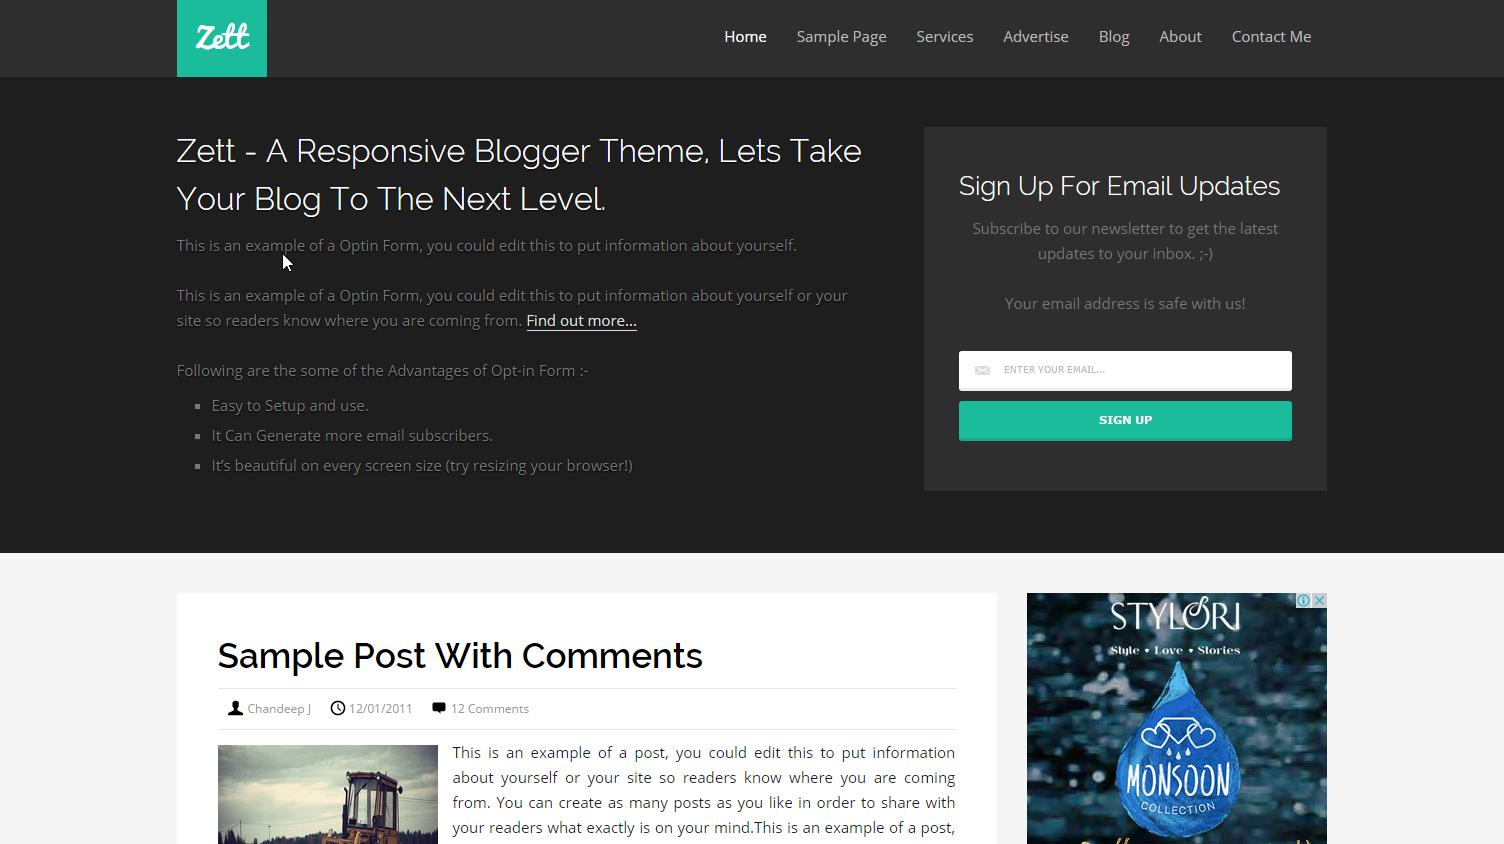 zett-blogger-theme